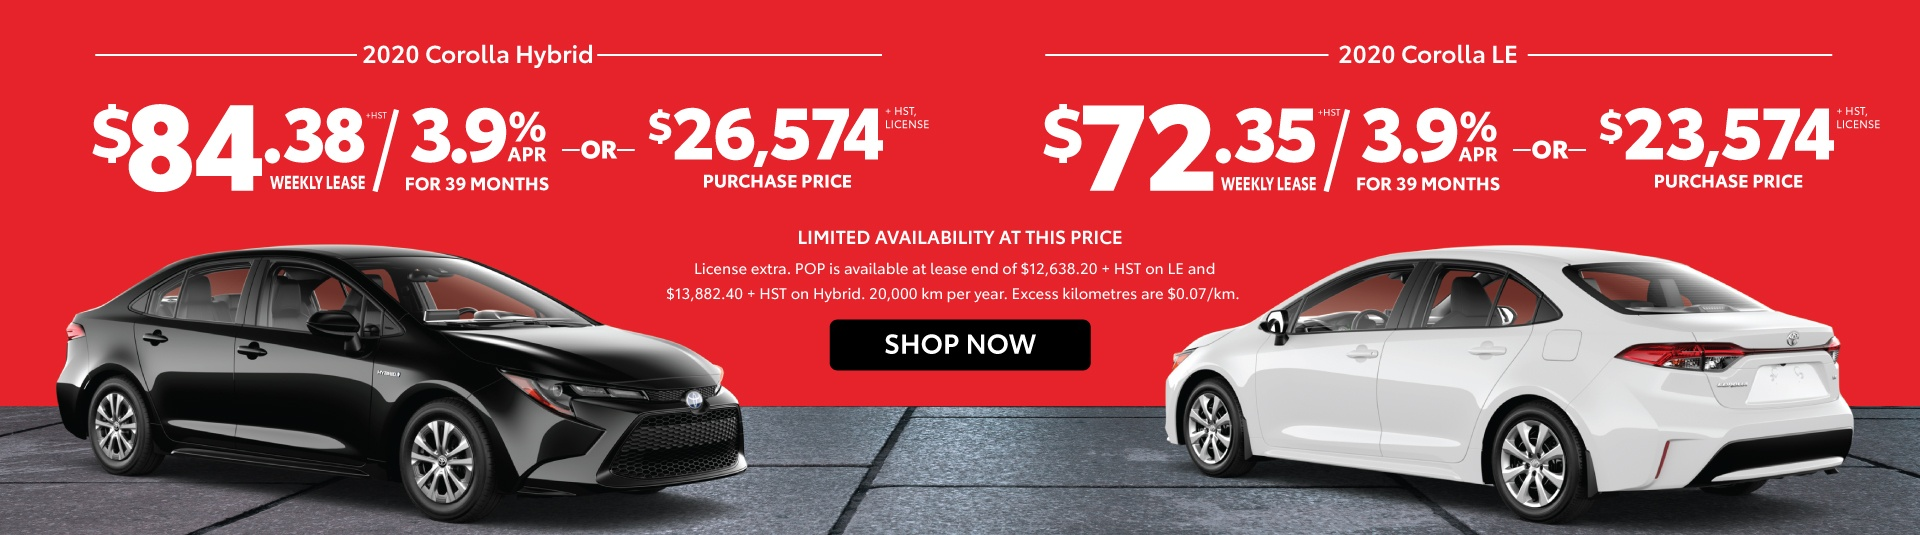 2020 Corolla and Hybrid